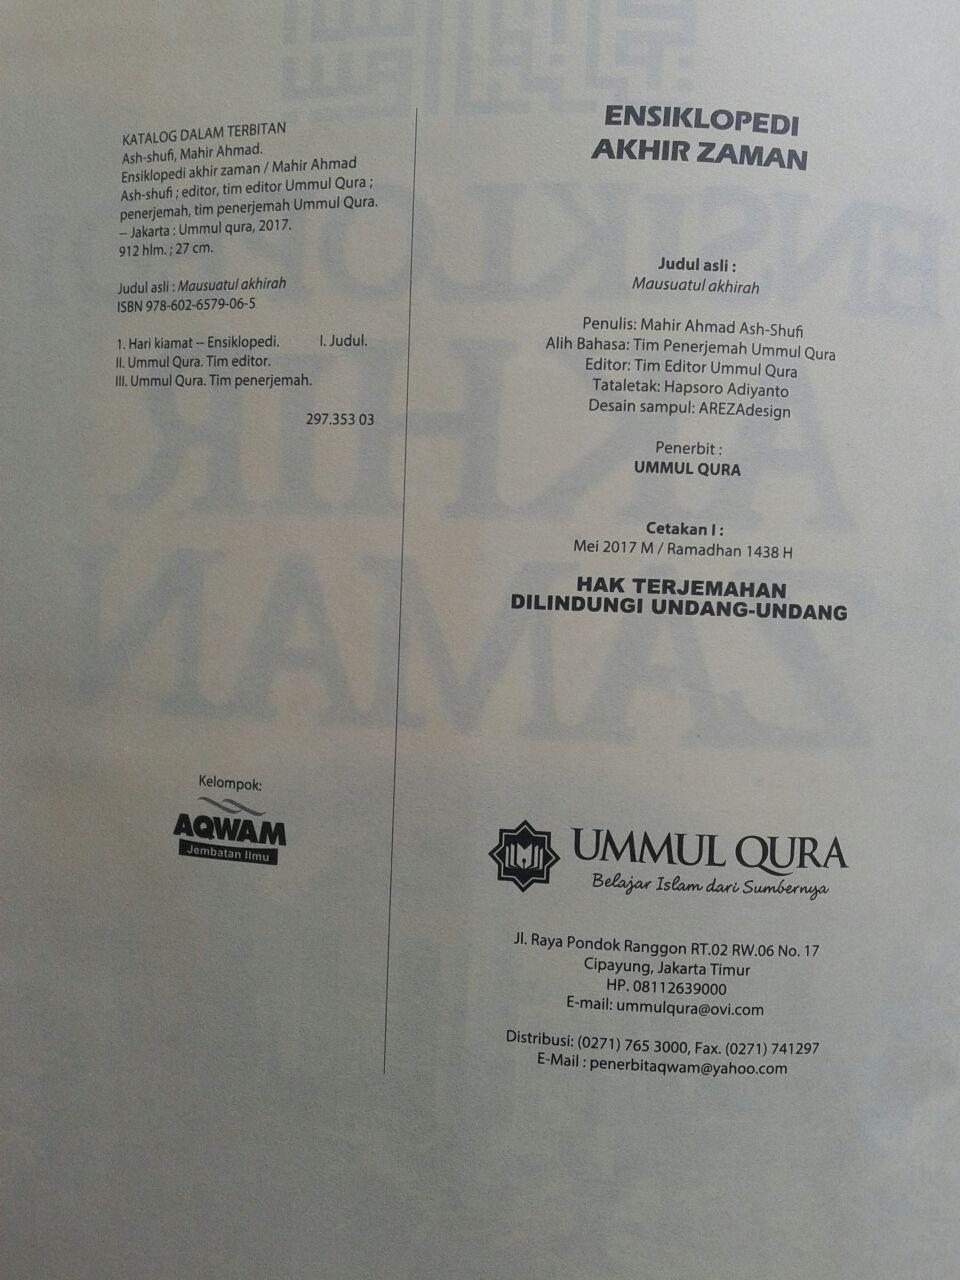 Buku Ensiklopedi Akhir Zaman 199.000 20% 159.200 Ummul Qura isi 3